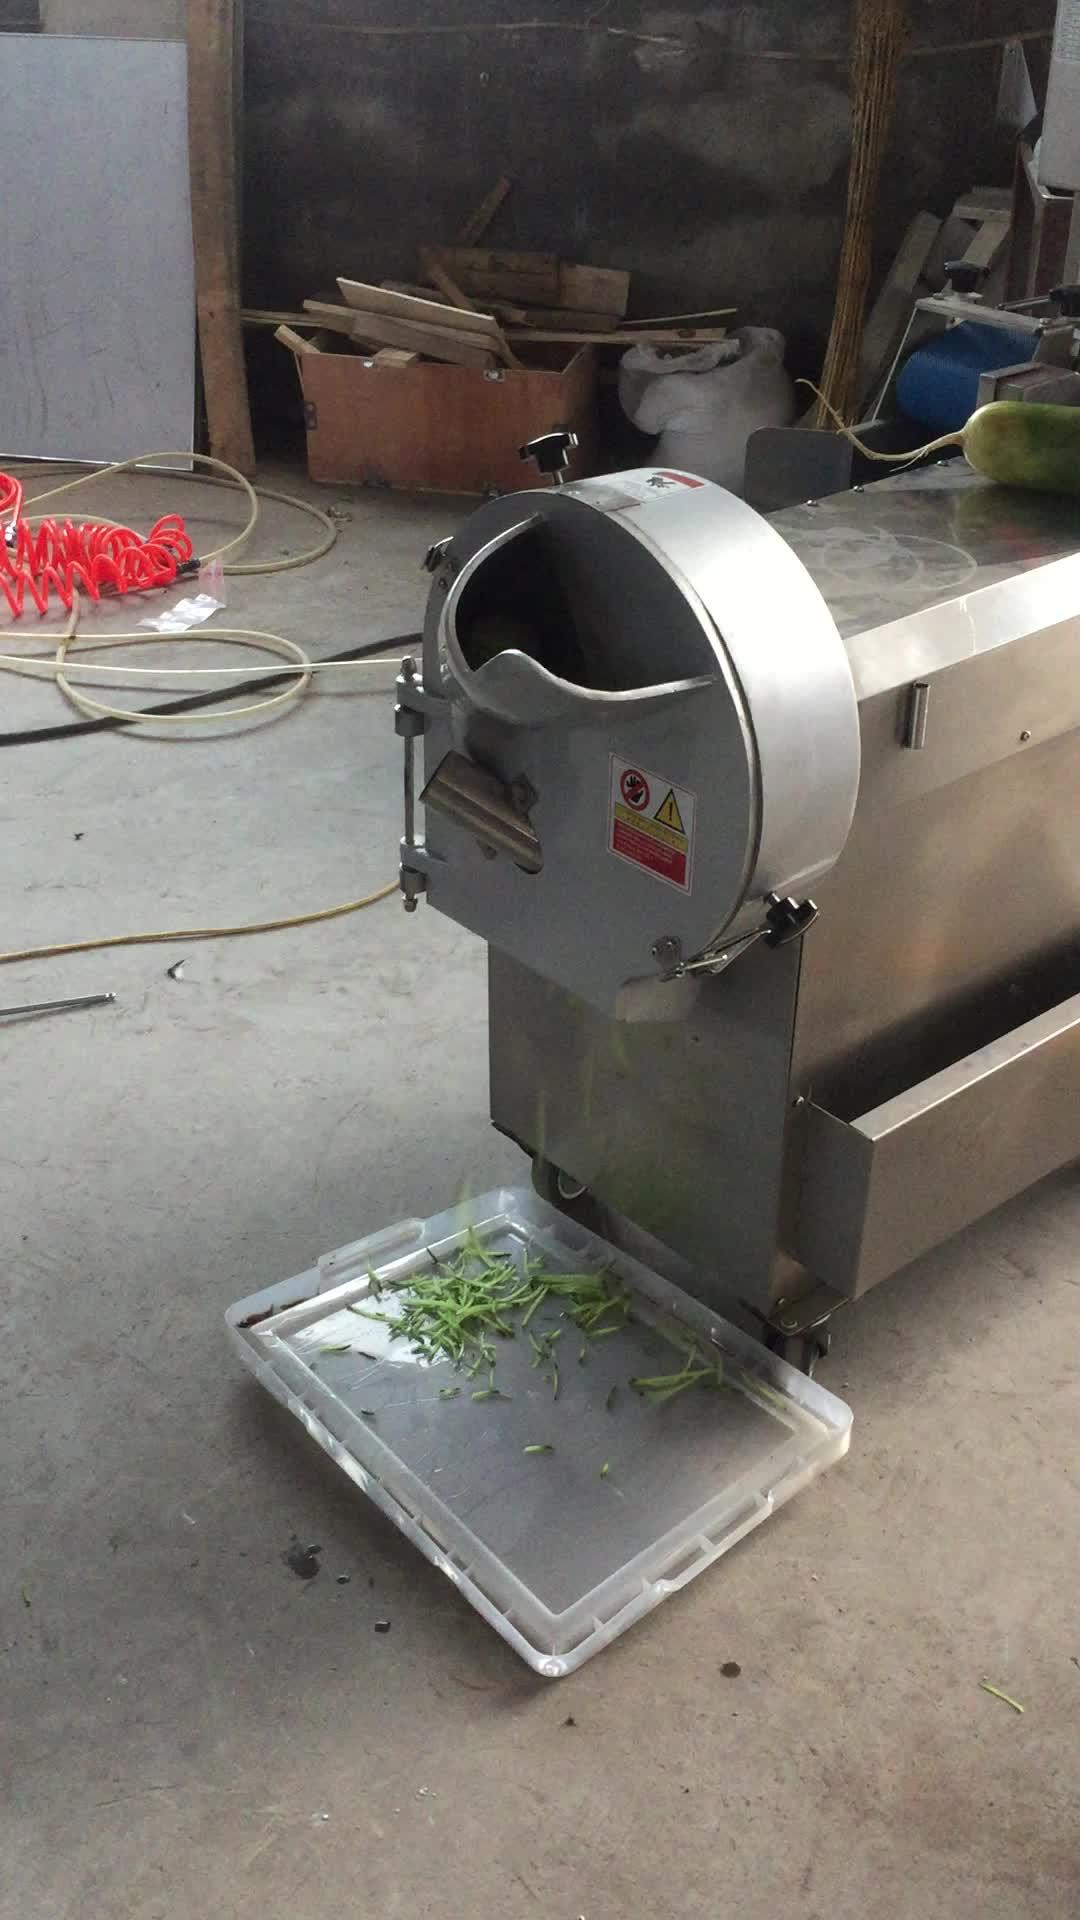 Green leafy vegetable commercial cabbage shredder beet cutter machine